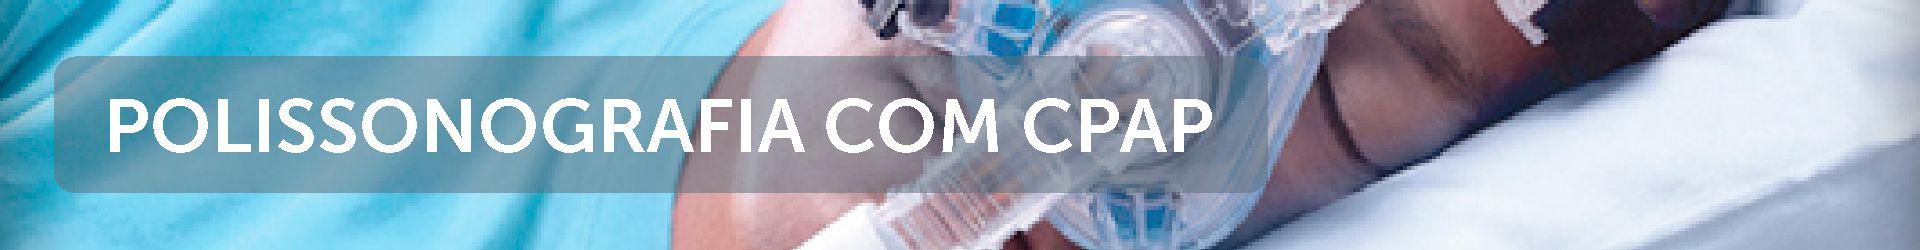 nucleo-persono-procedimentos-polissonografia-com-cpap